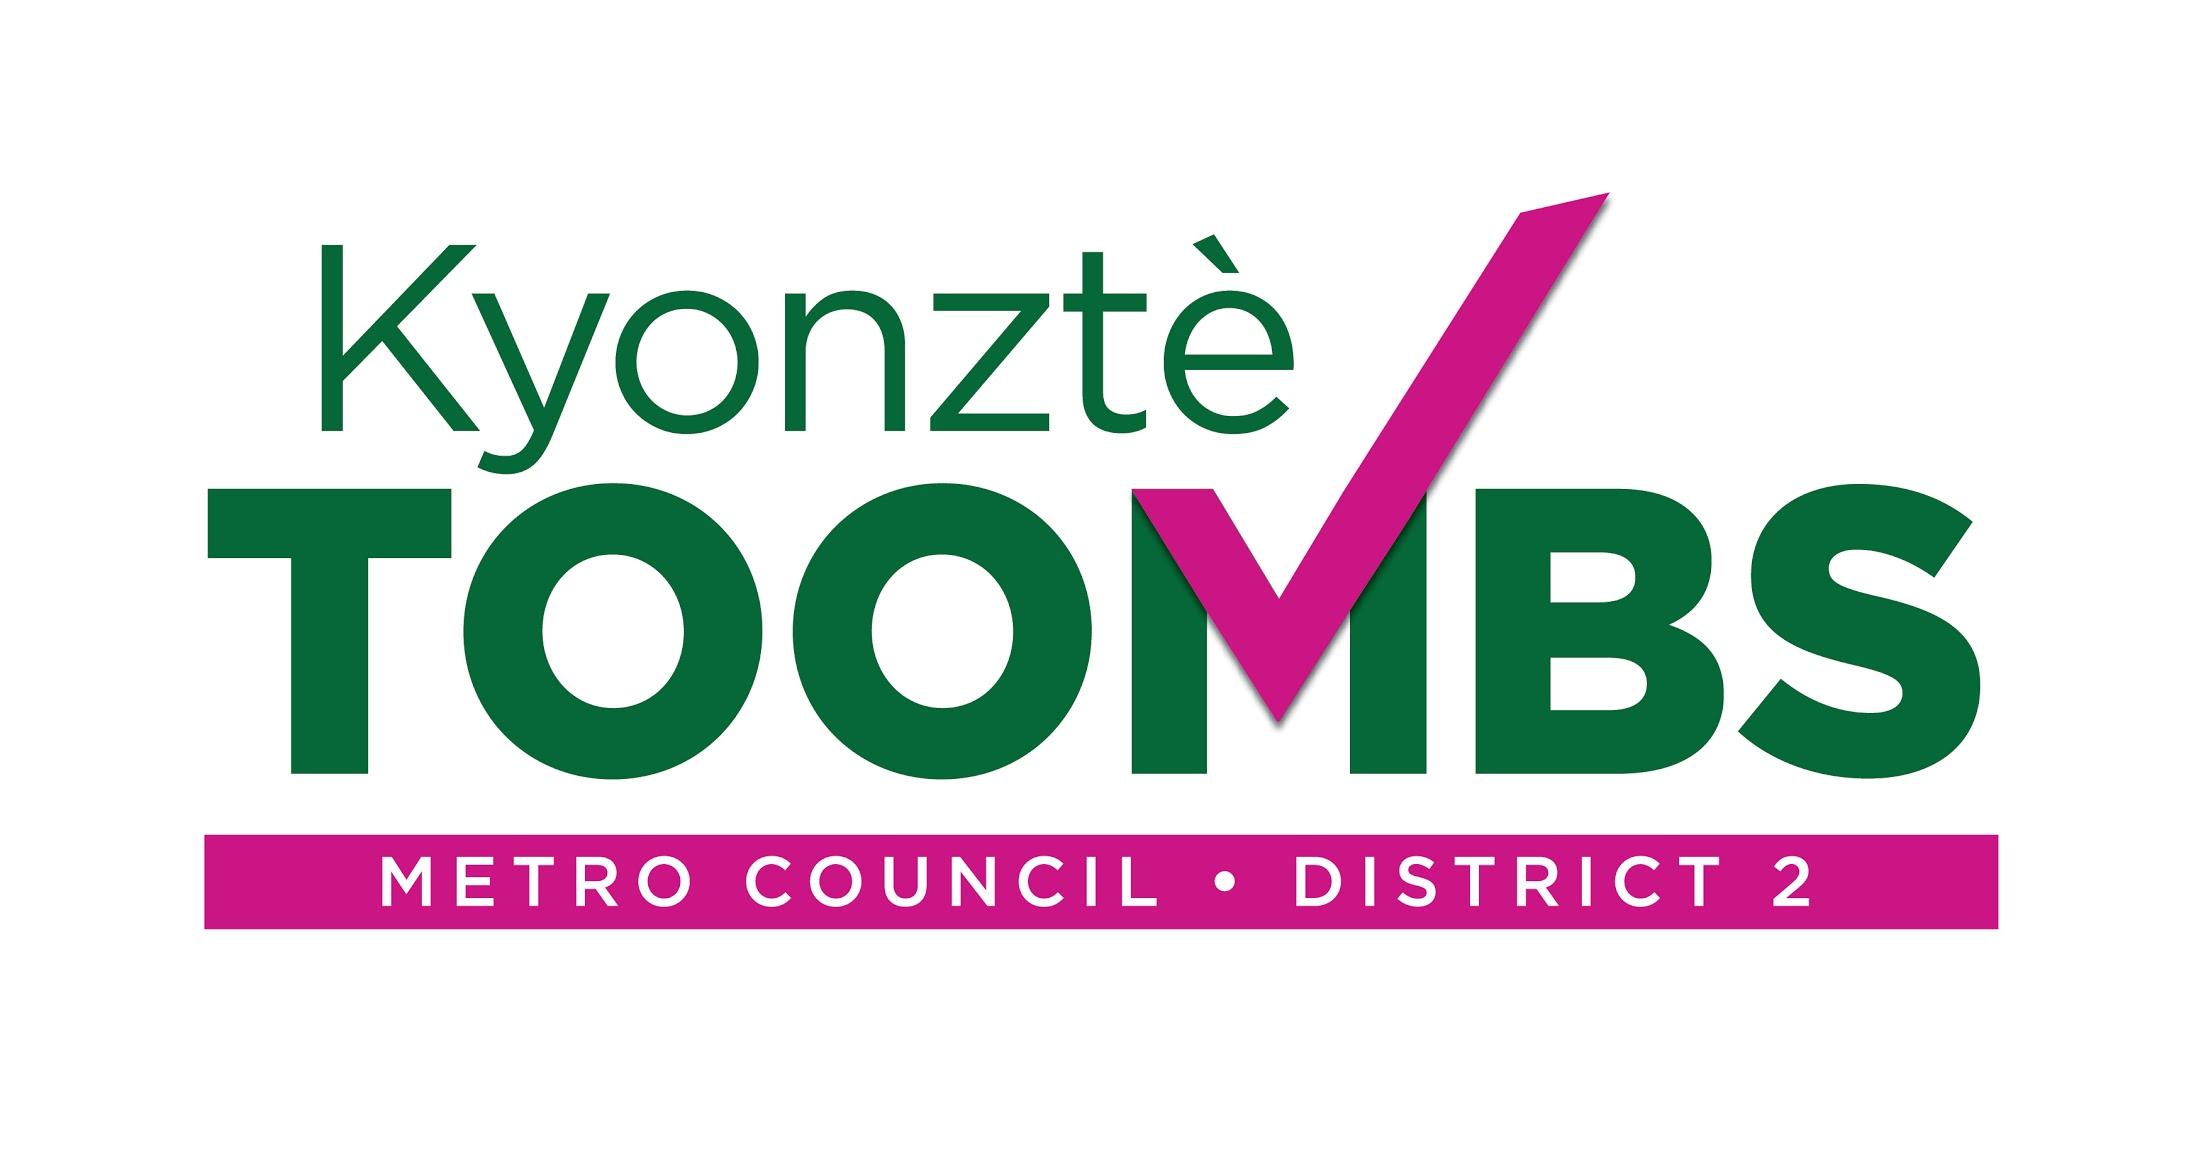 Kyonzte Toombs